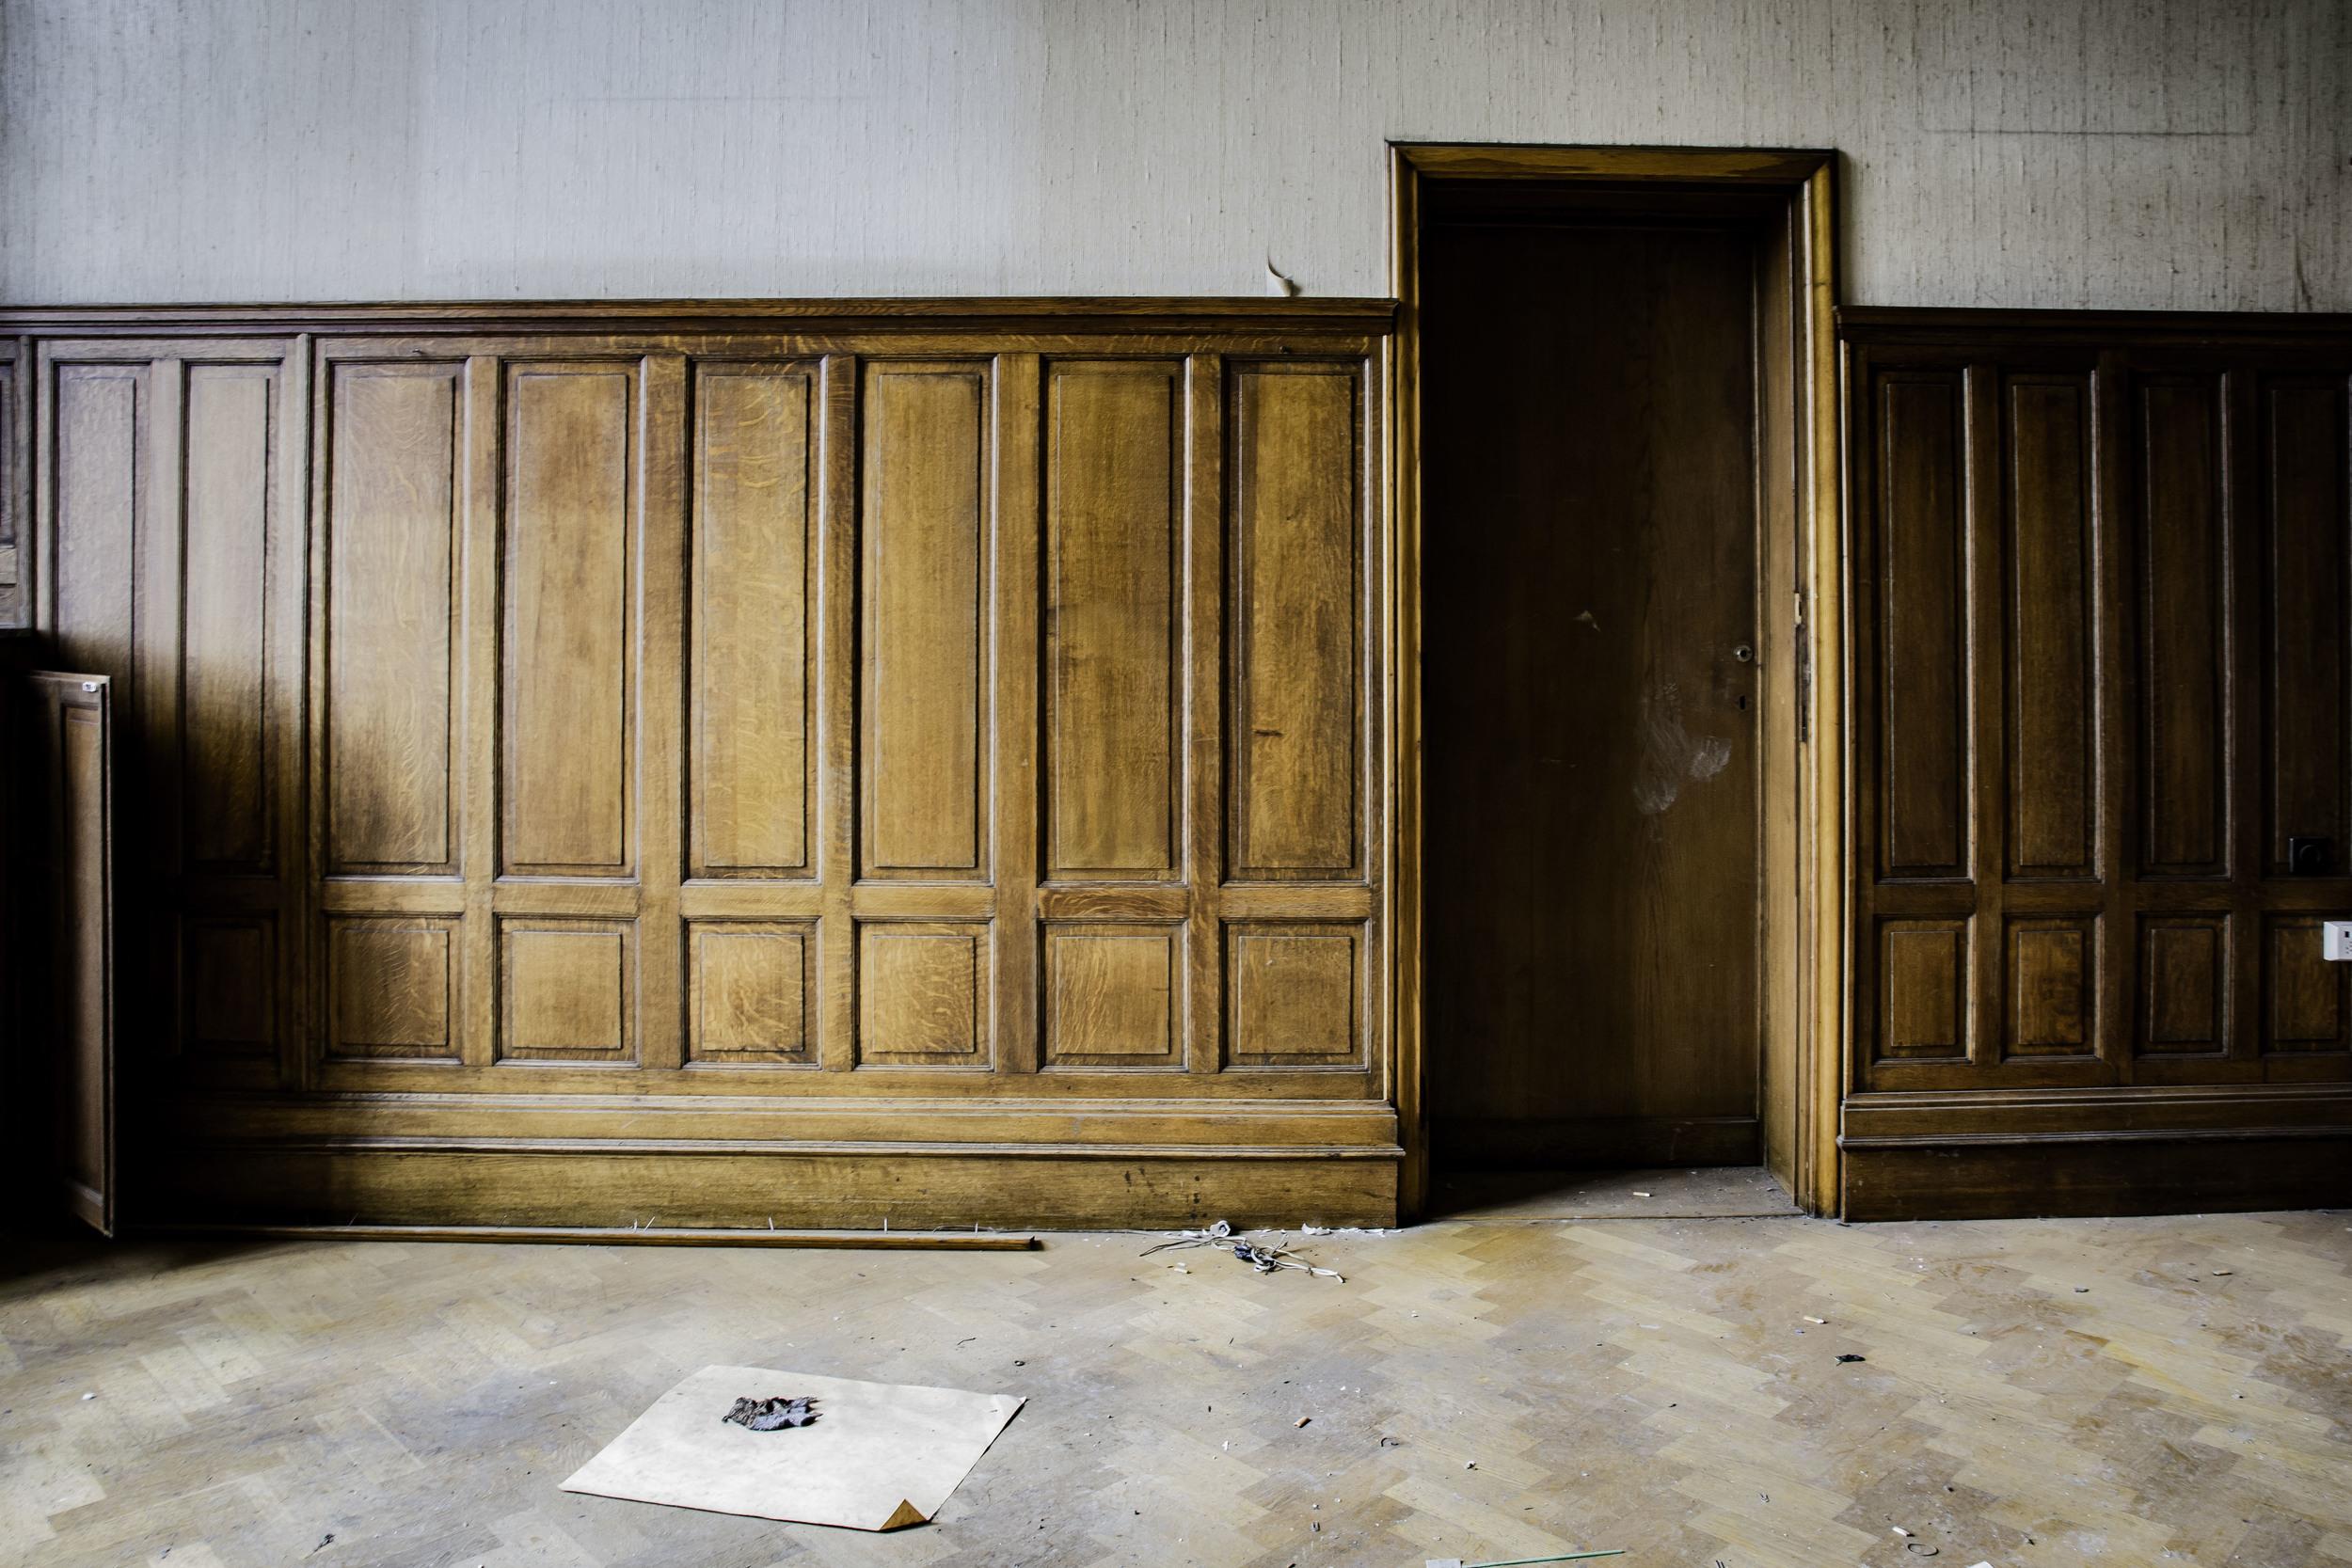 viewfinder-eigenzinnigie-fotografie-urbex-vergane-glorie-oude-papierfabriek-kantoor-directeur